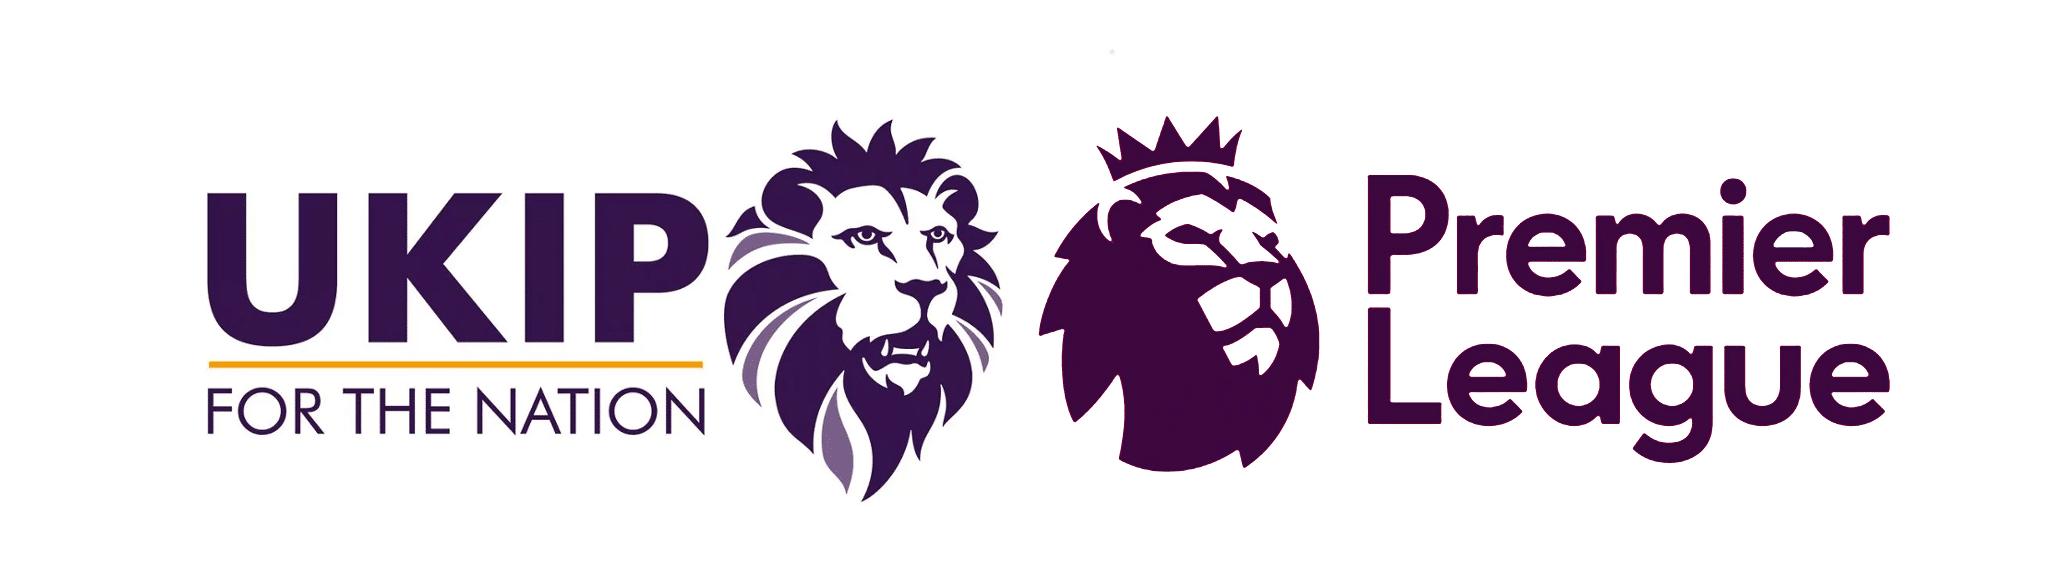 New UKIP logo vs Premier League logo